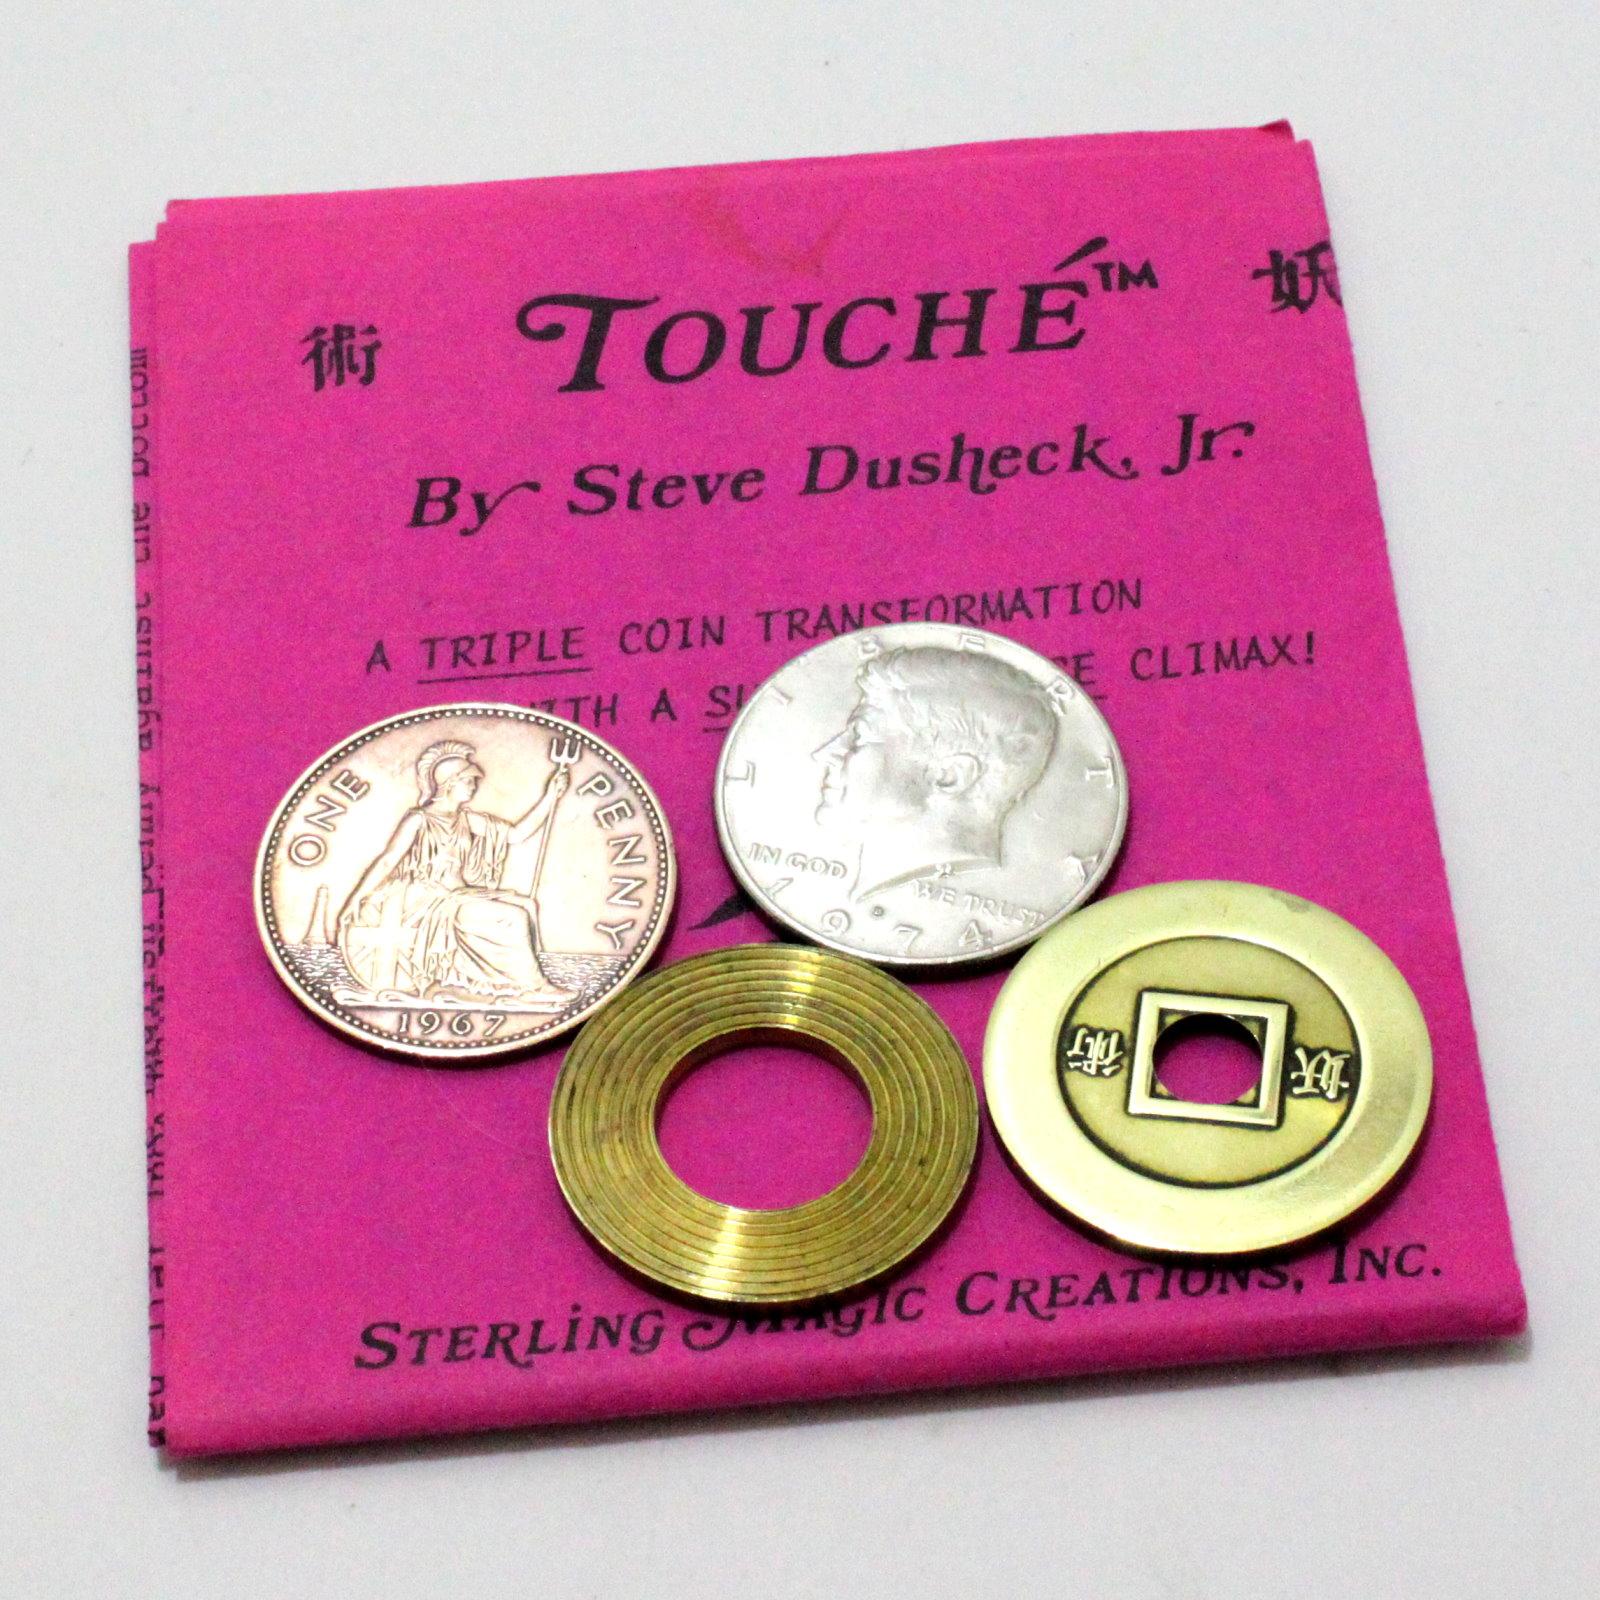 Touche by Steve Dusheck